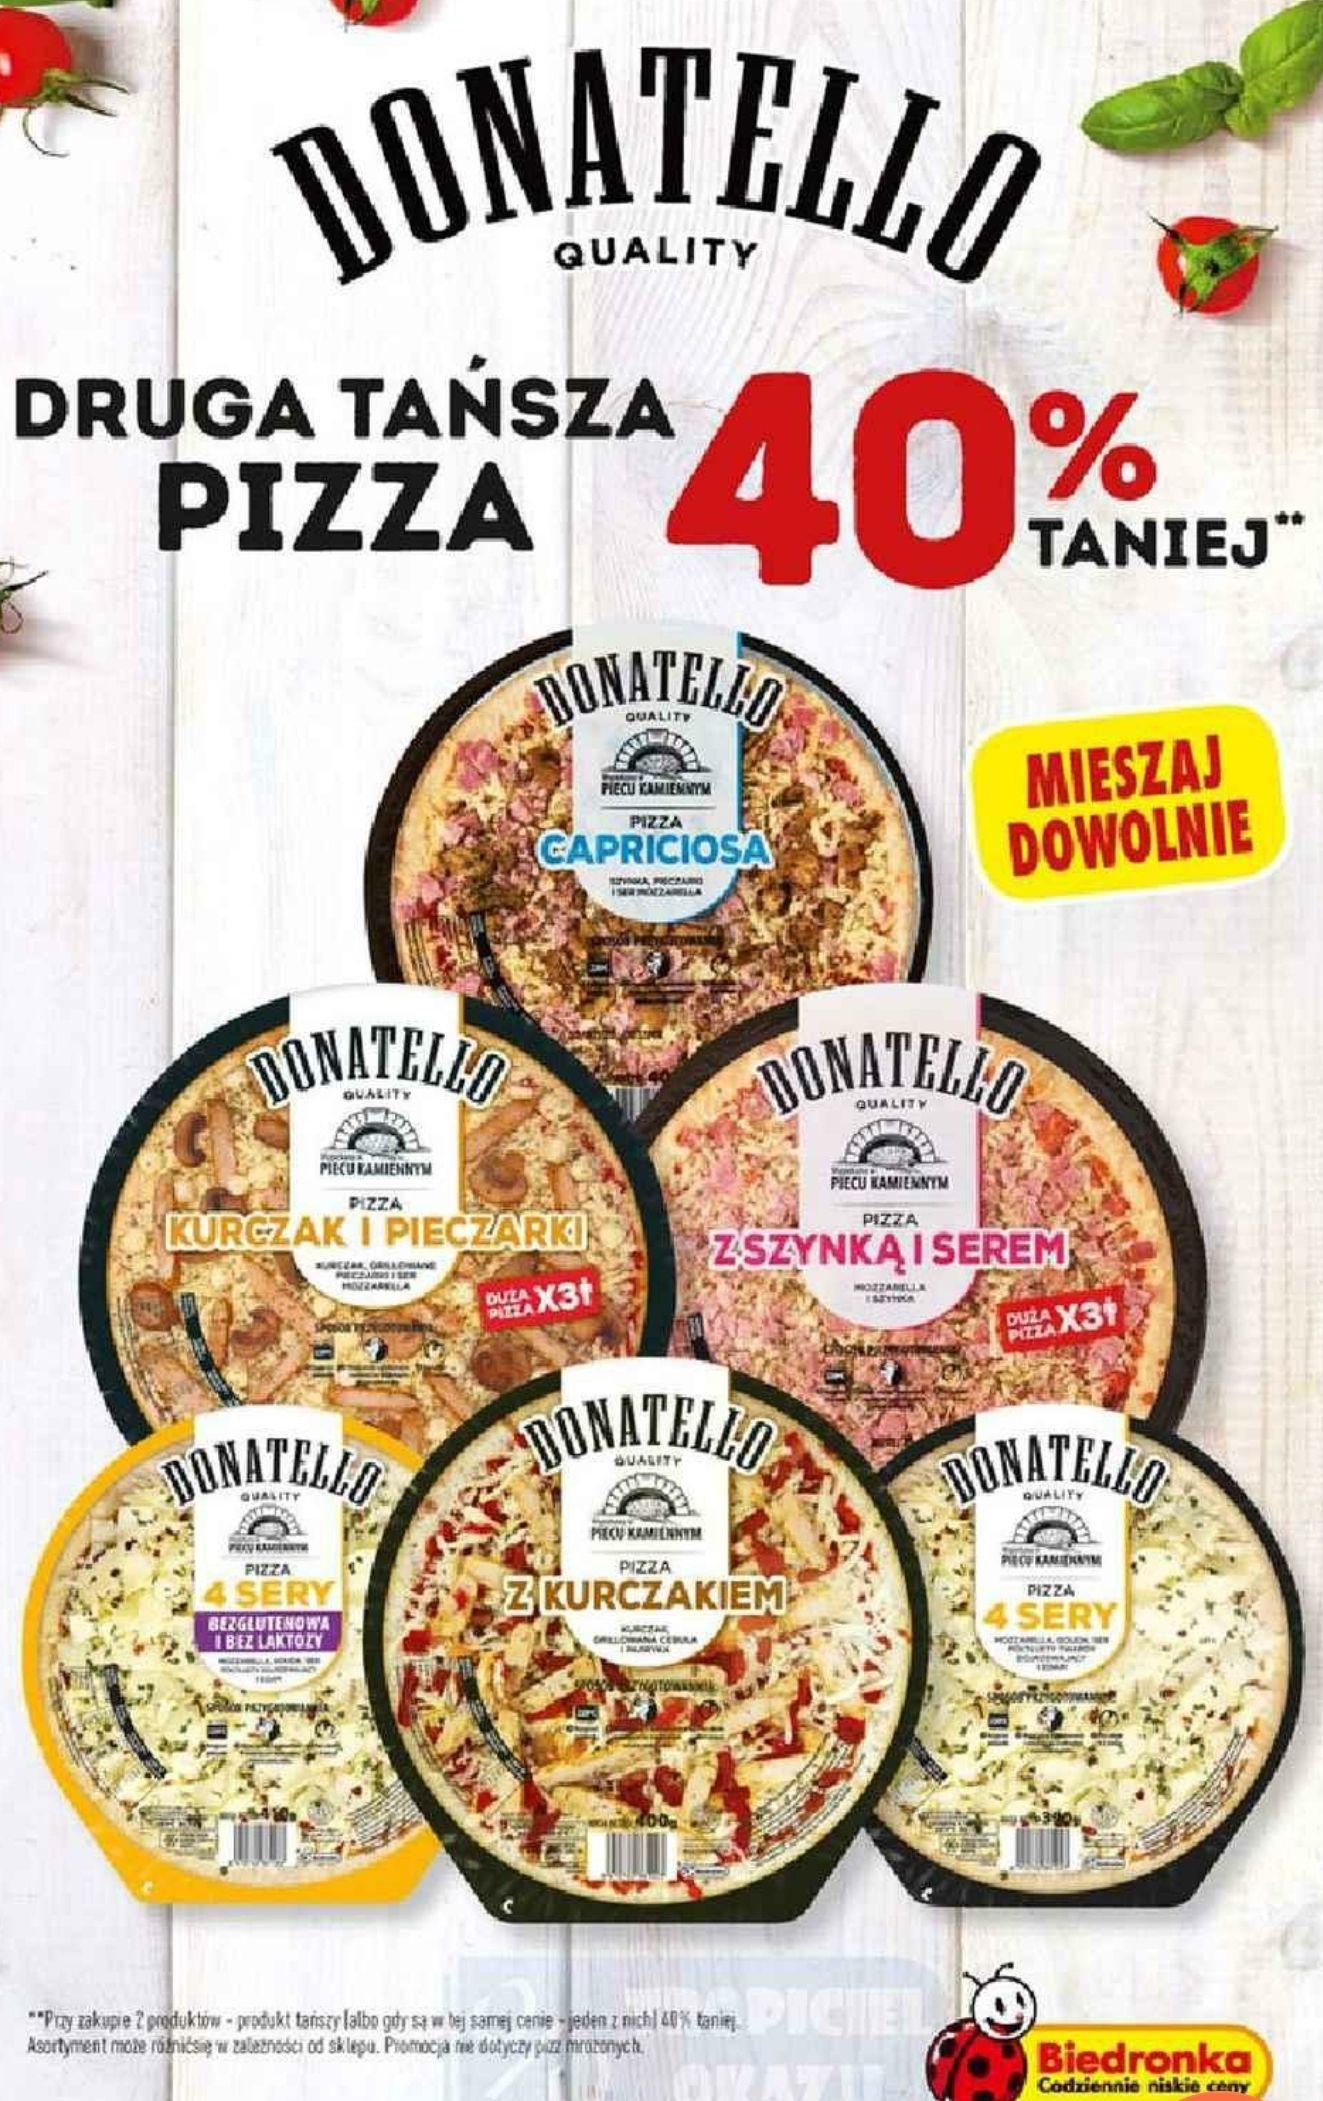 Biedronka. Pizza Donatello - druga 40% taniej